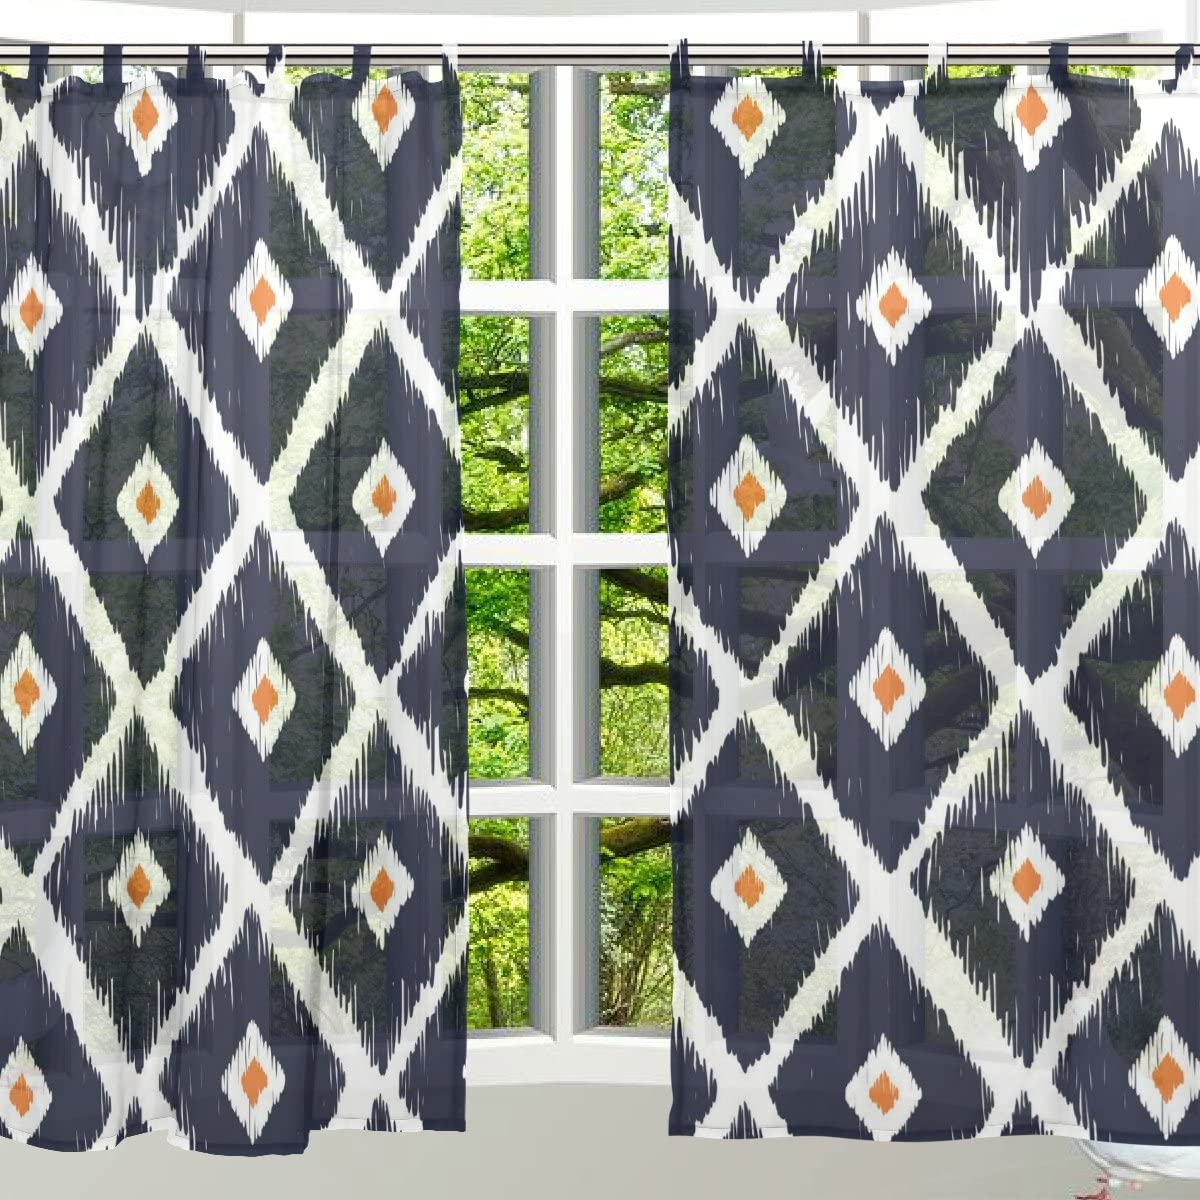 ALAZA Window Decoration Sheer Curtain Panels,Vintage Ethnic African Aztec Tribal Pattern,Door Window Gauze Curtains Living Room Bedroom Kid s Office Window Tie Top Curtain 55×78 inch Two Panels Set